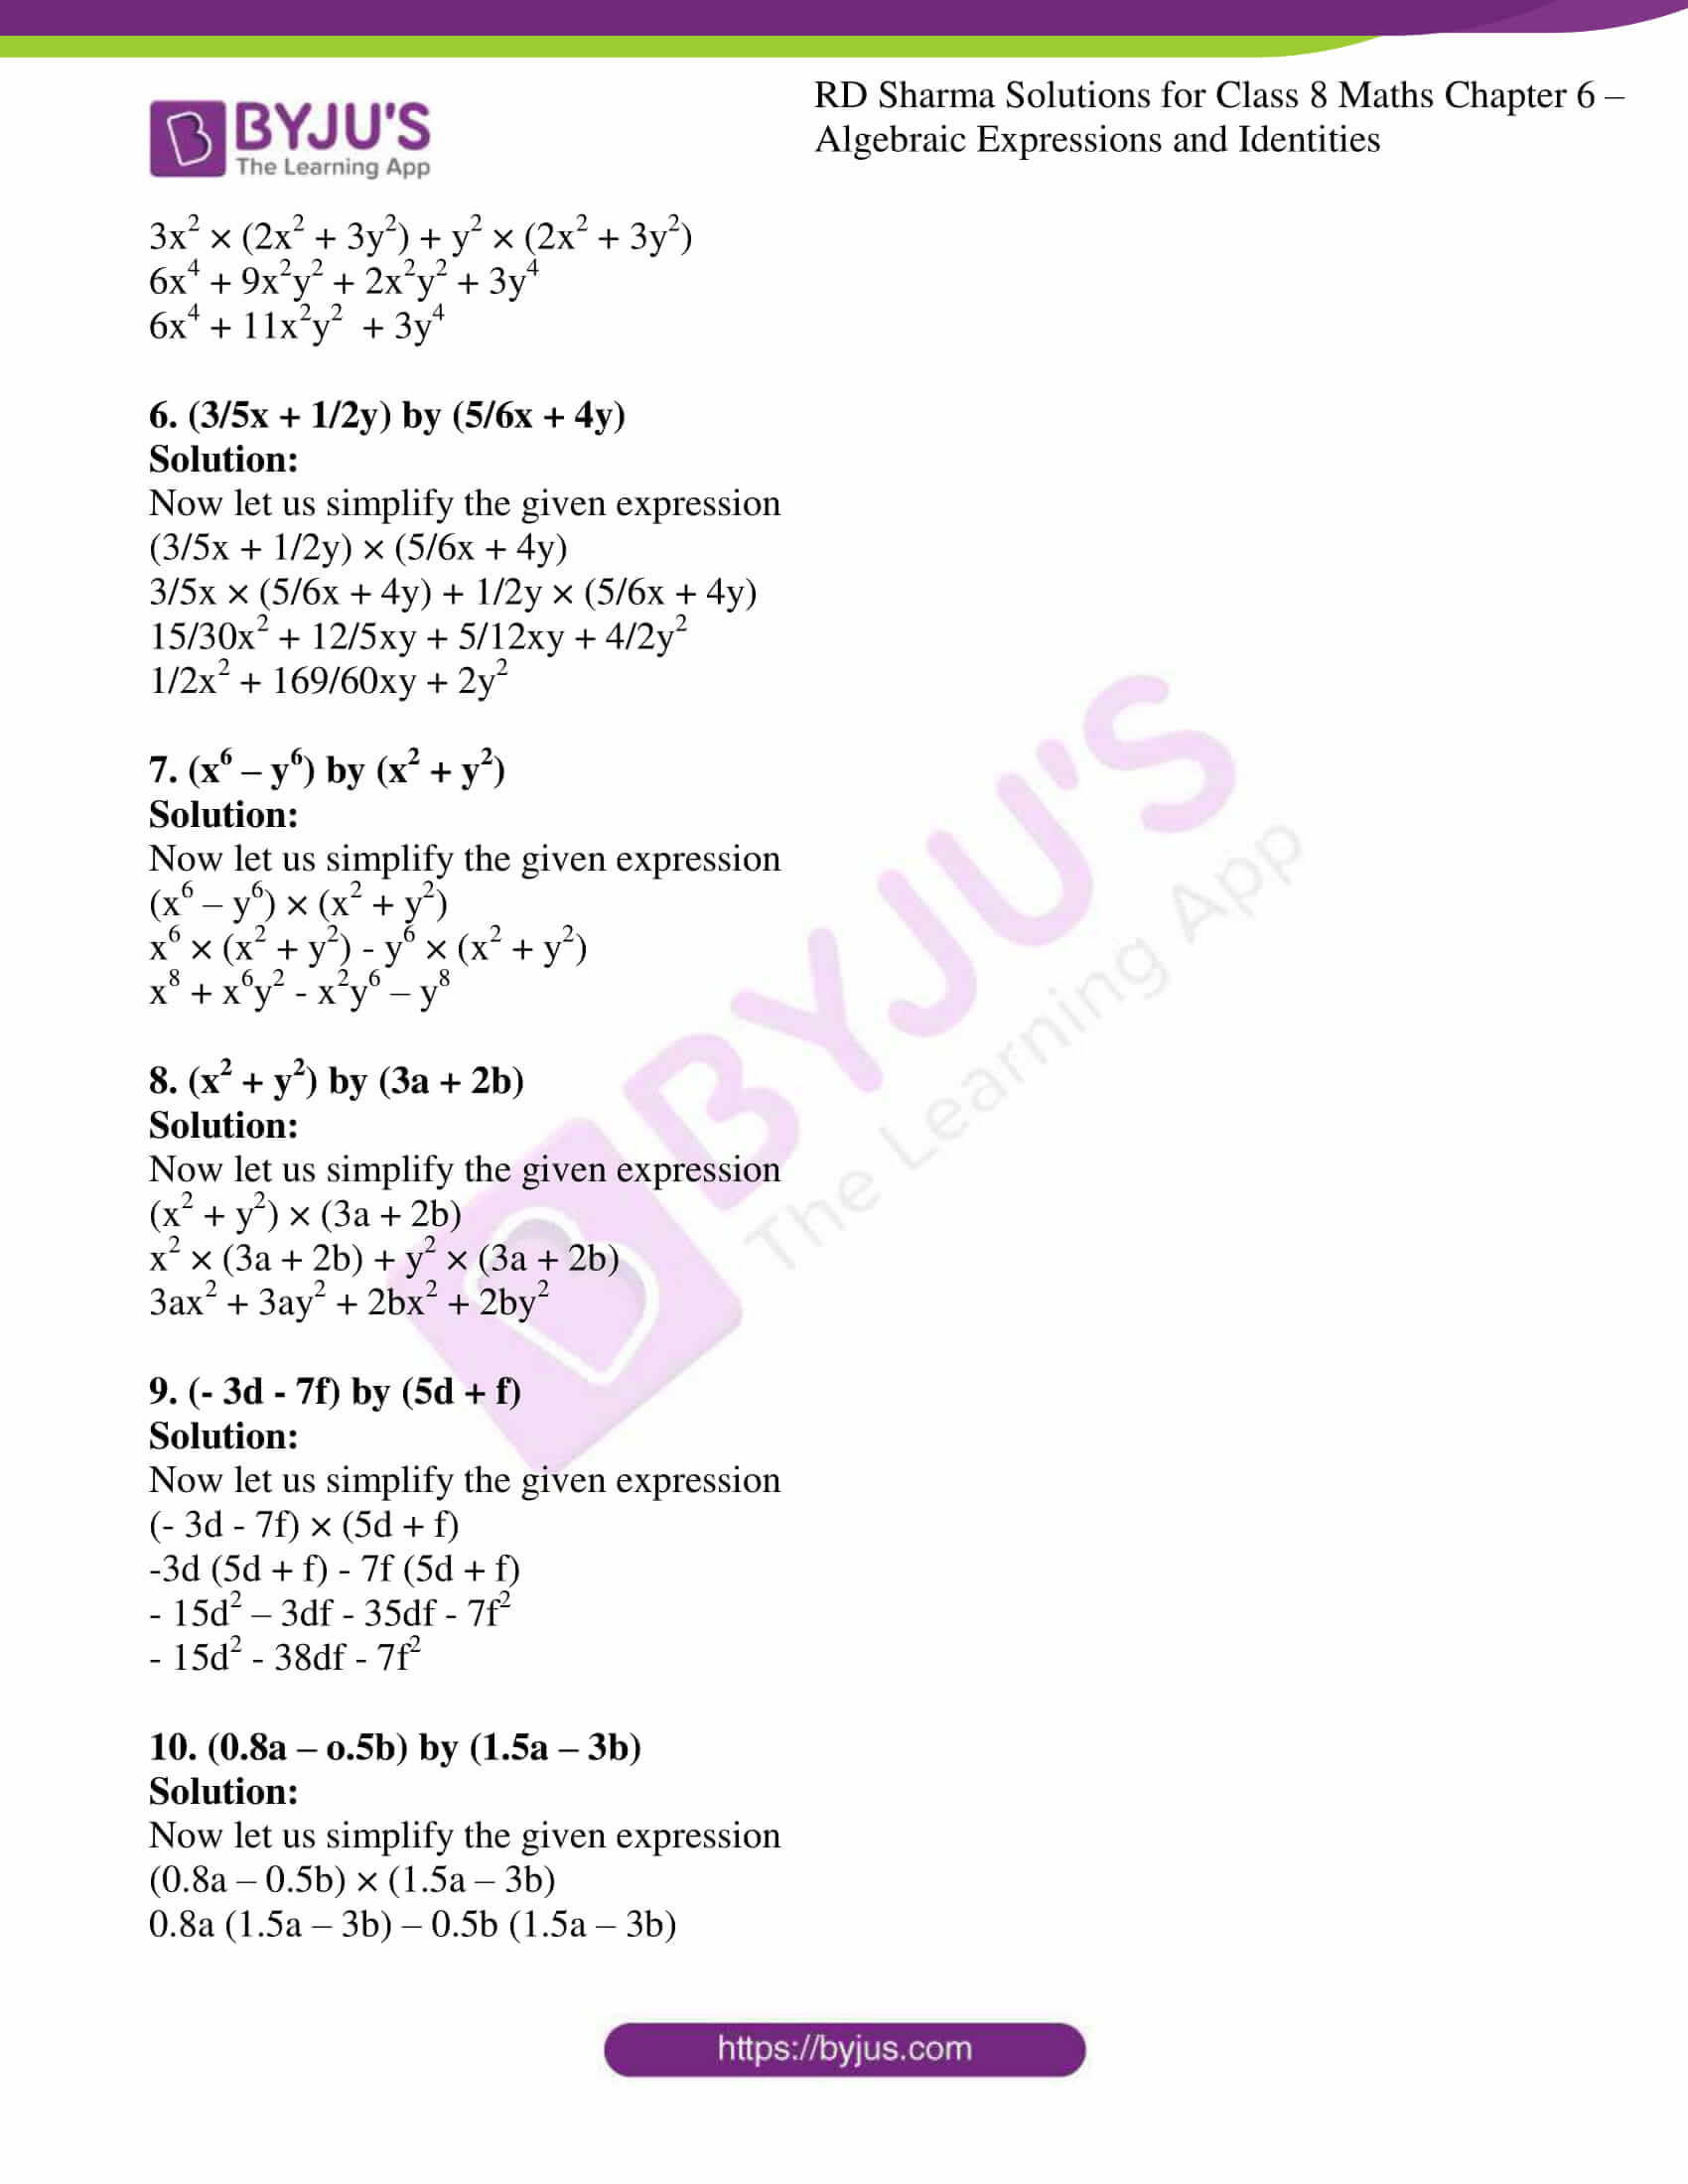 rd sharma class 8 maths chapter 6 exercise 5 2